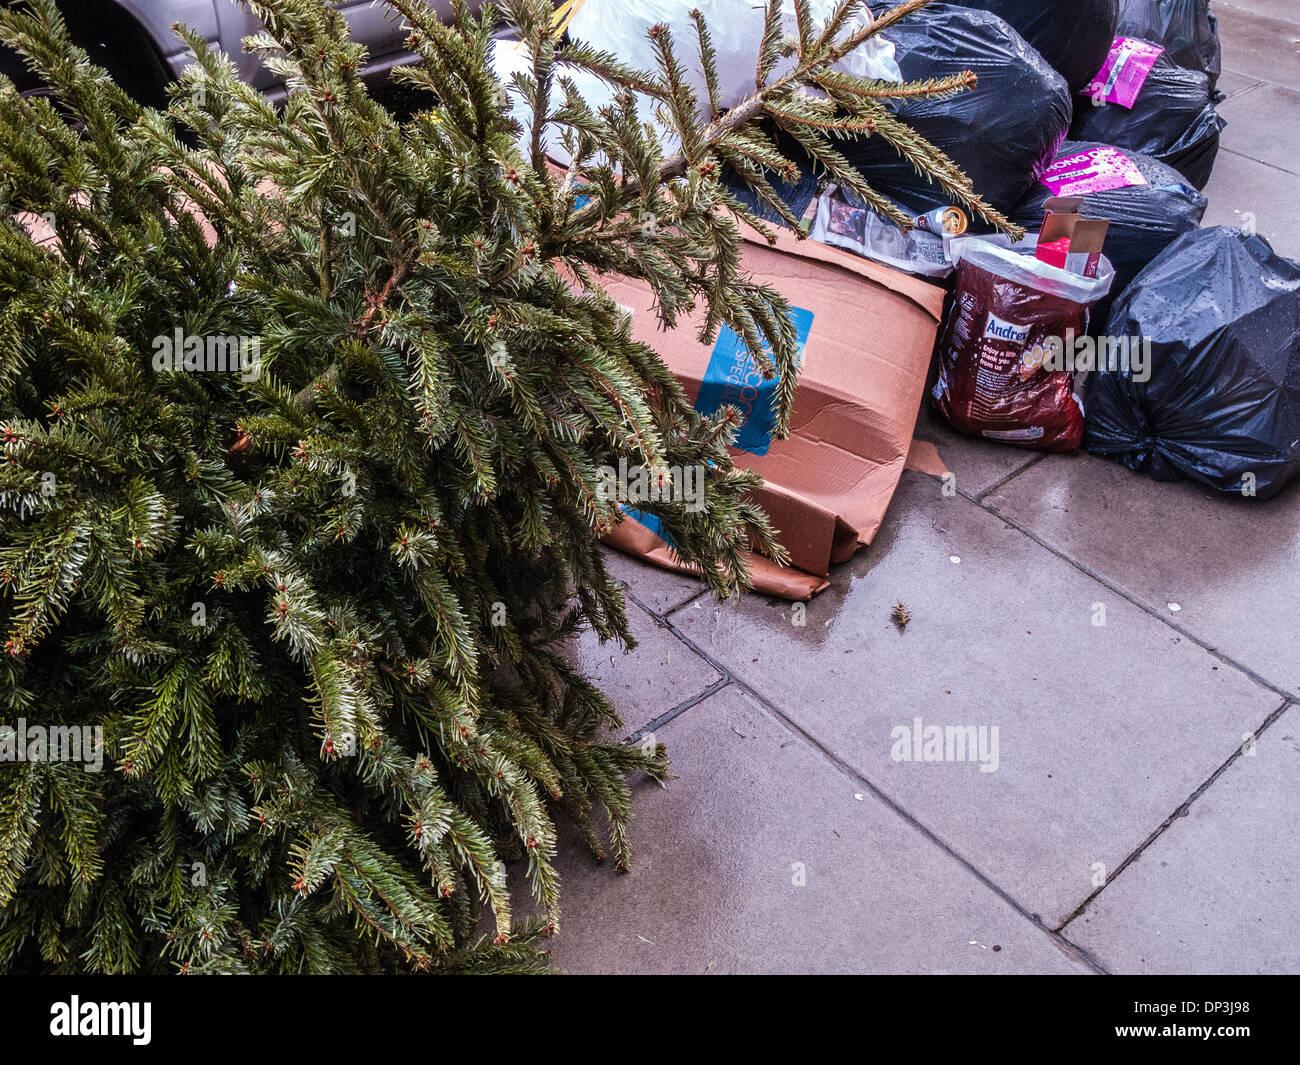 Christmas Tree Recycling und Abfallentsorgung Stockbild